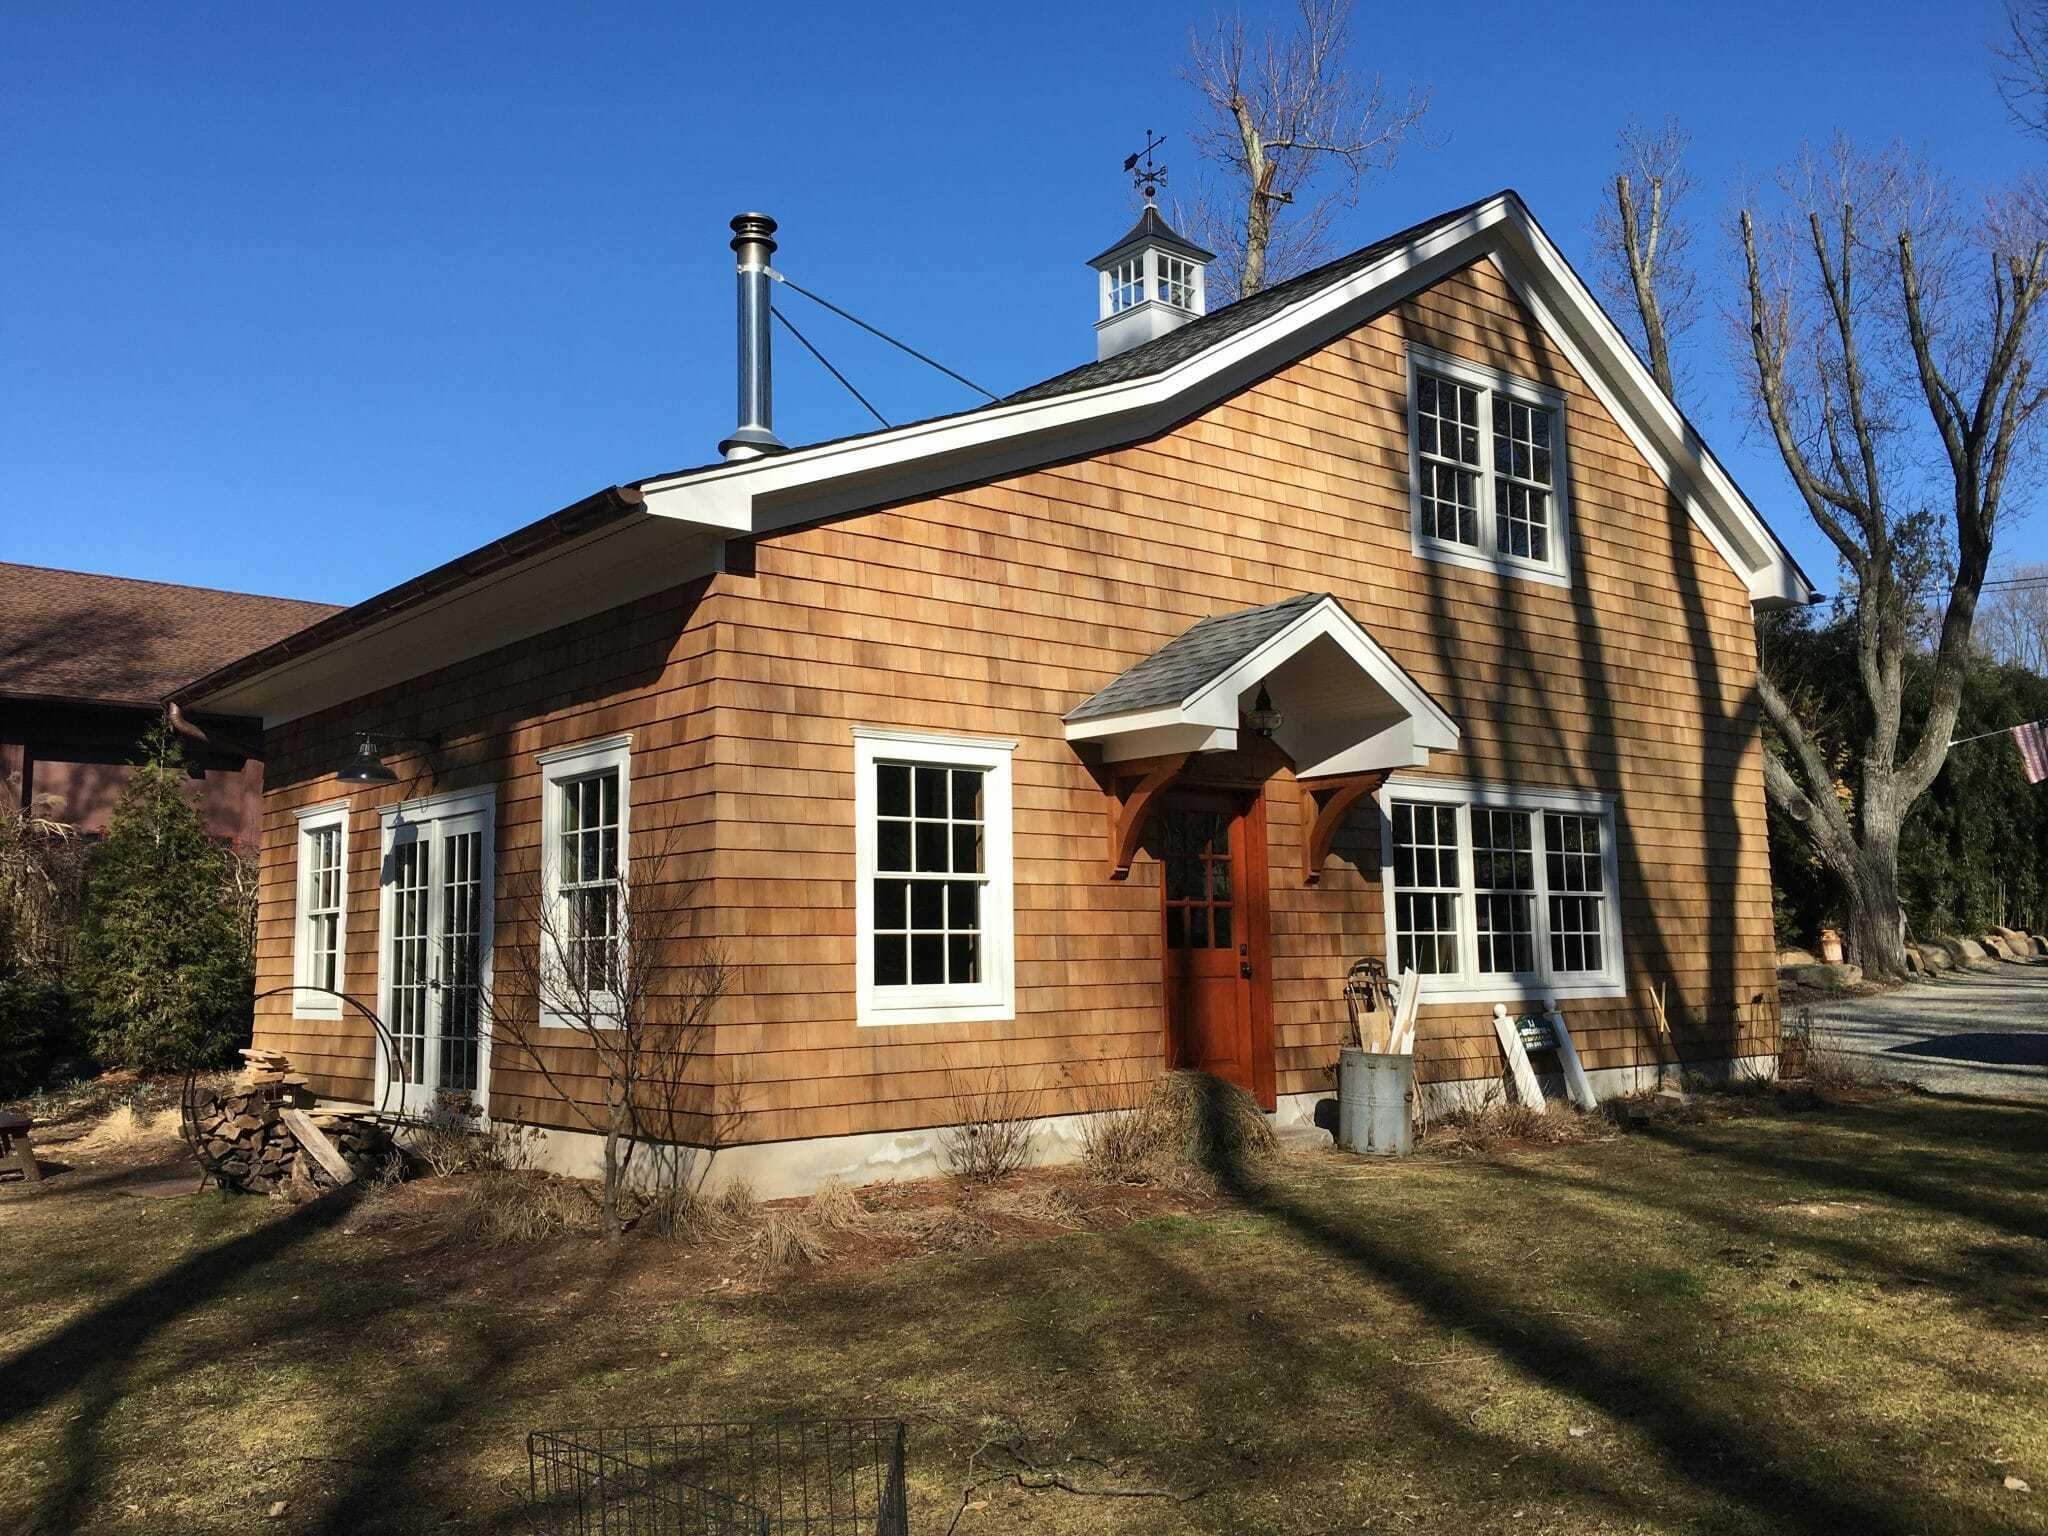 roofing shingles - Western Red Cedar